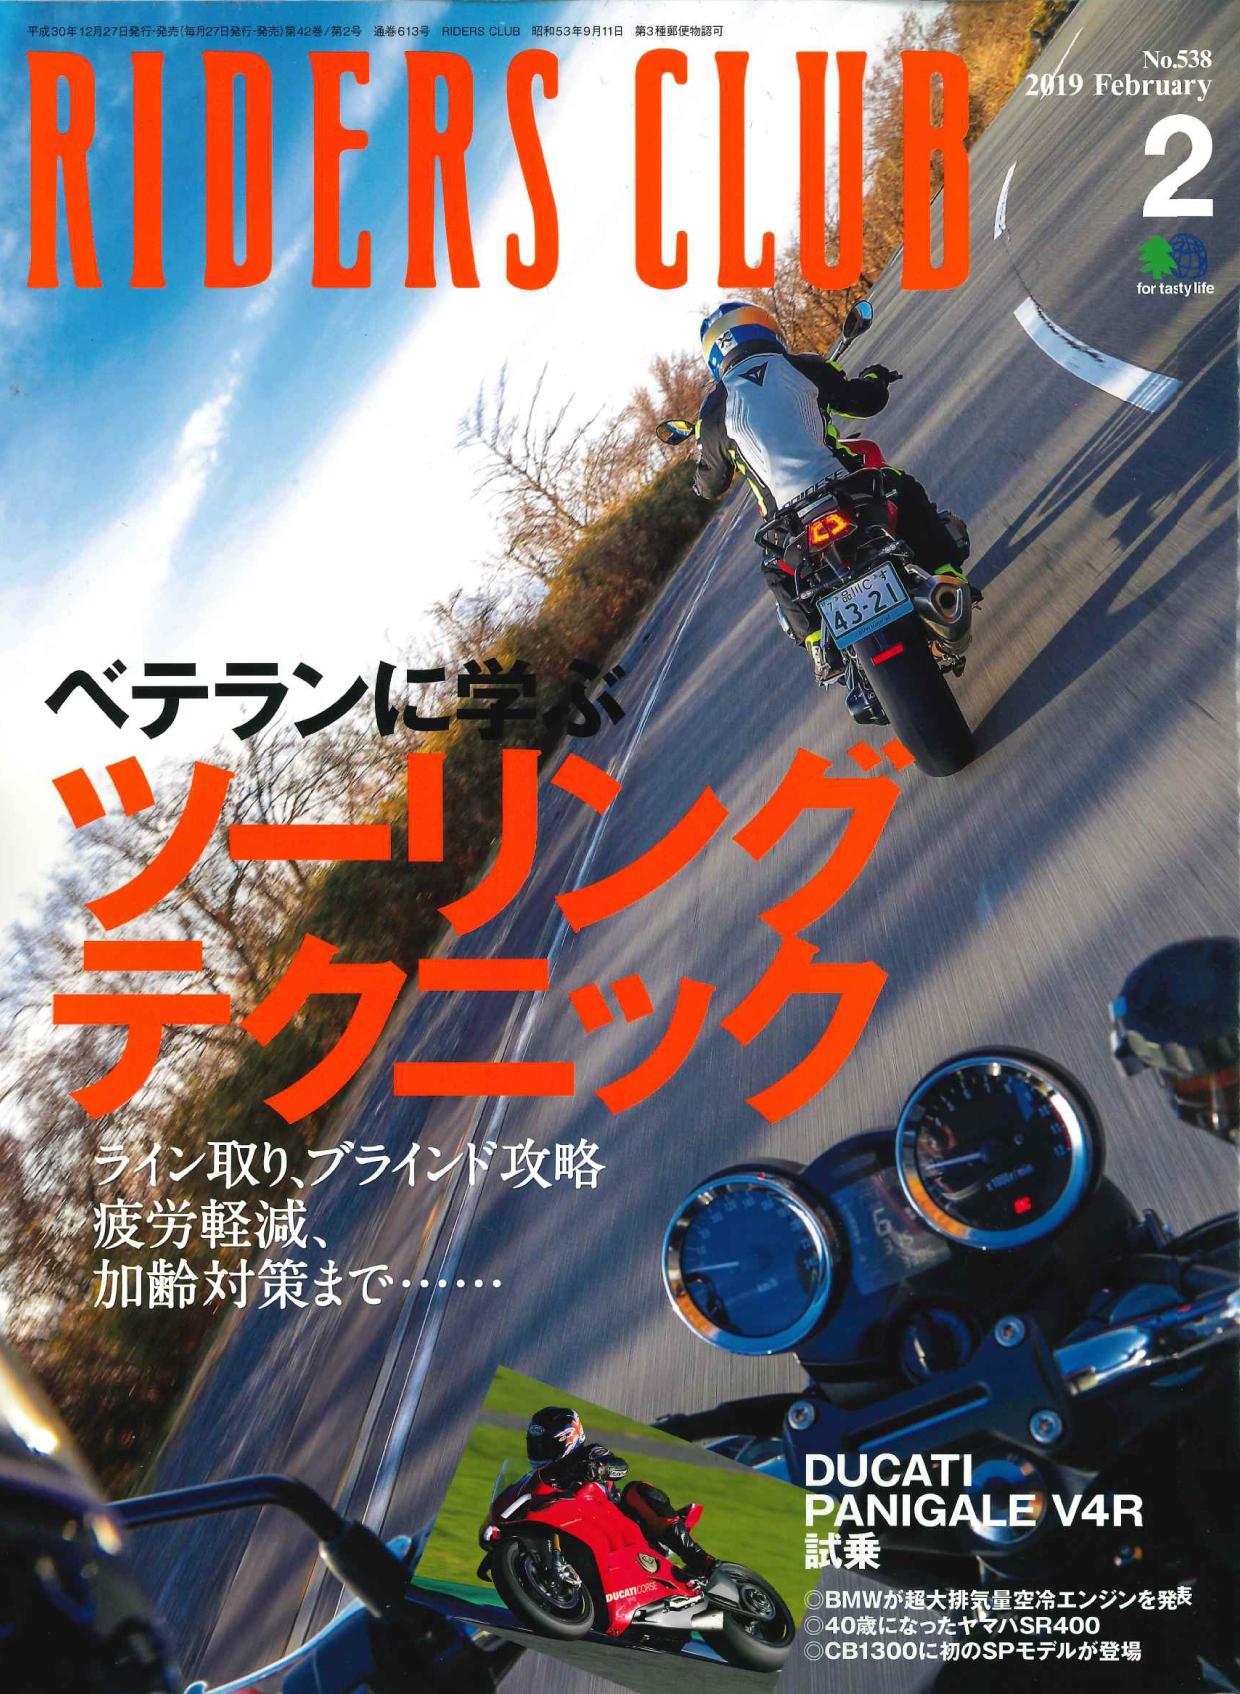 【RIDERS CLUB2月号掲載】Bitubo